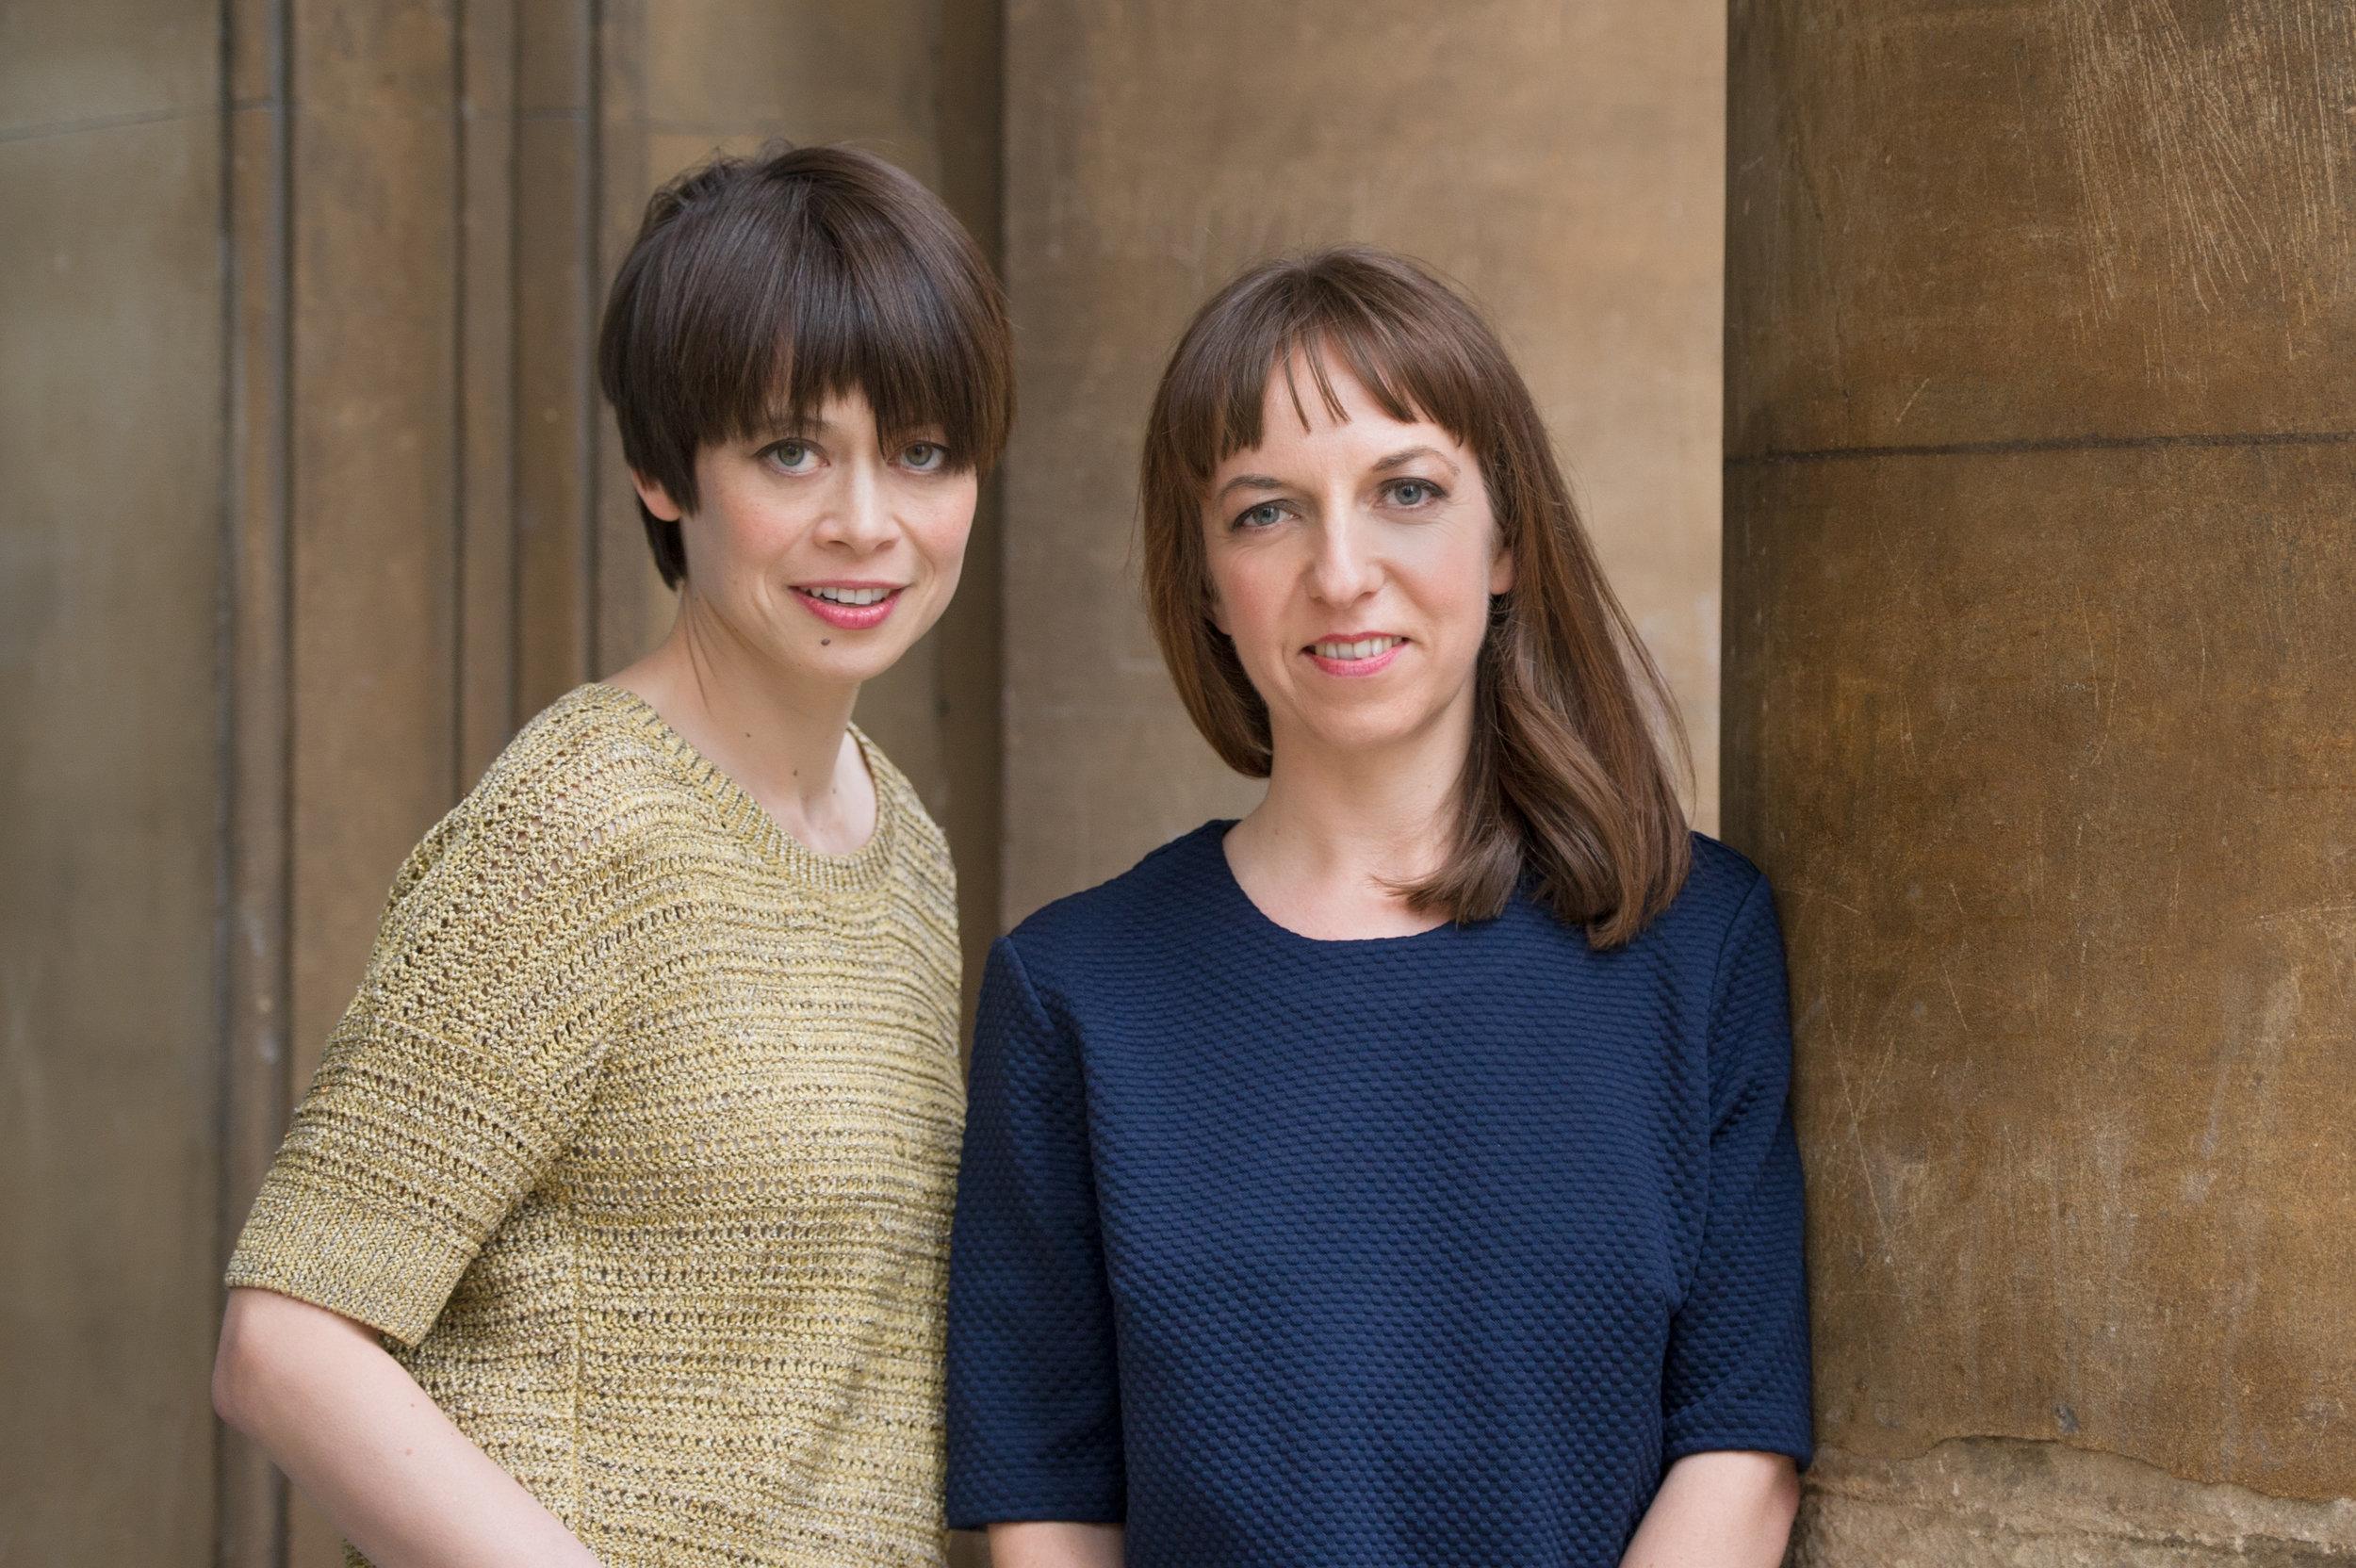 Emily Midorikawa & Emma Claire Sweeney, photo by Rosalind Hobley